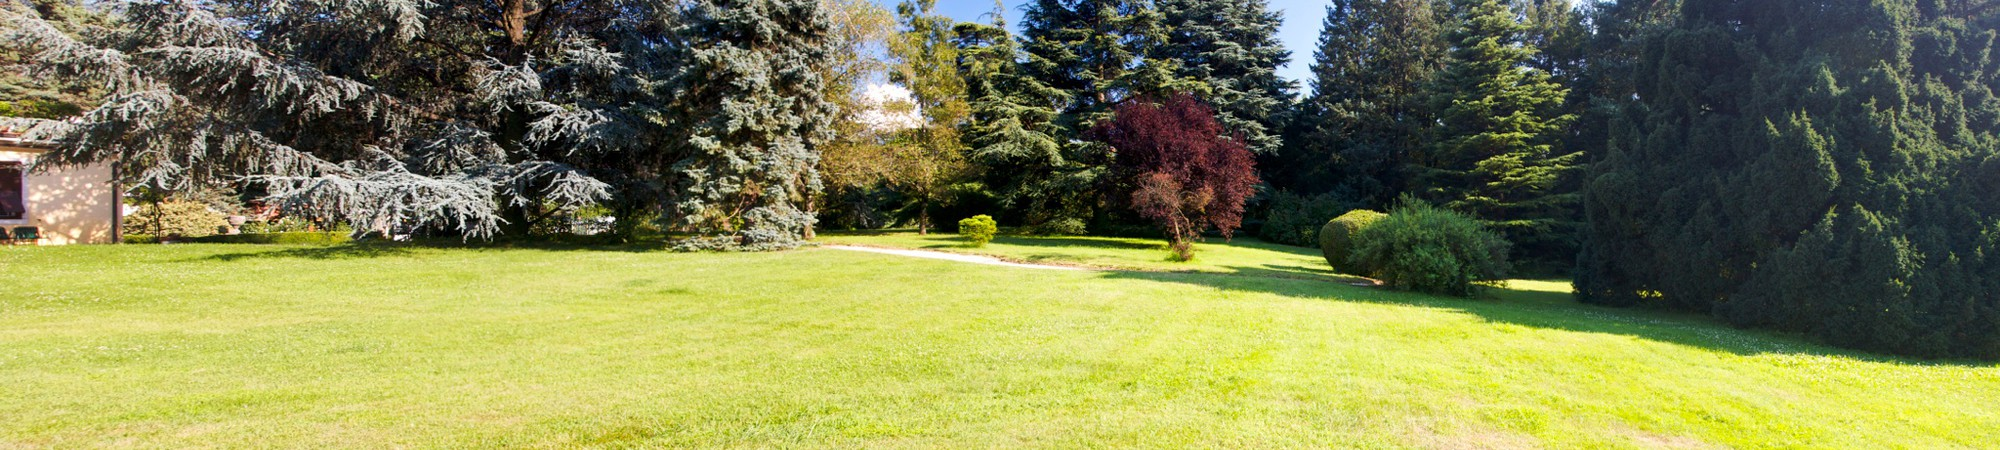 Giardini e Spazi